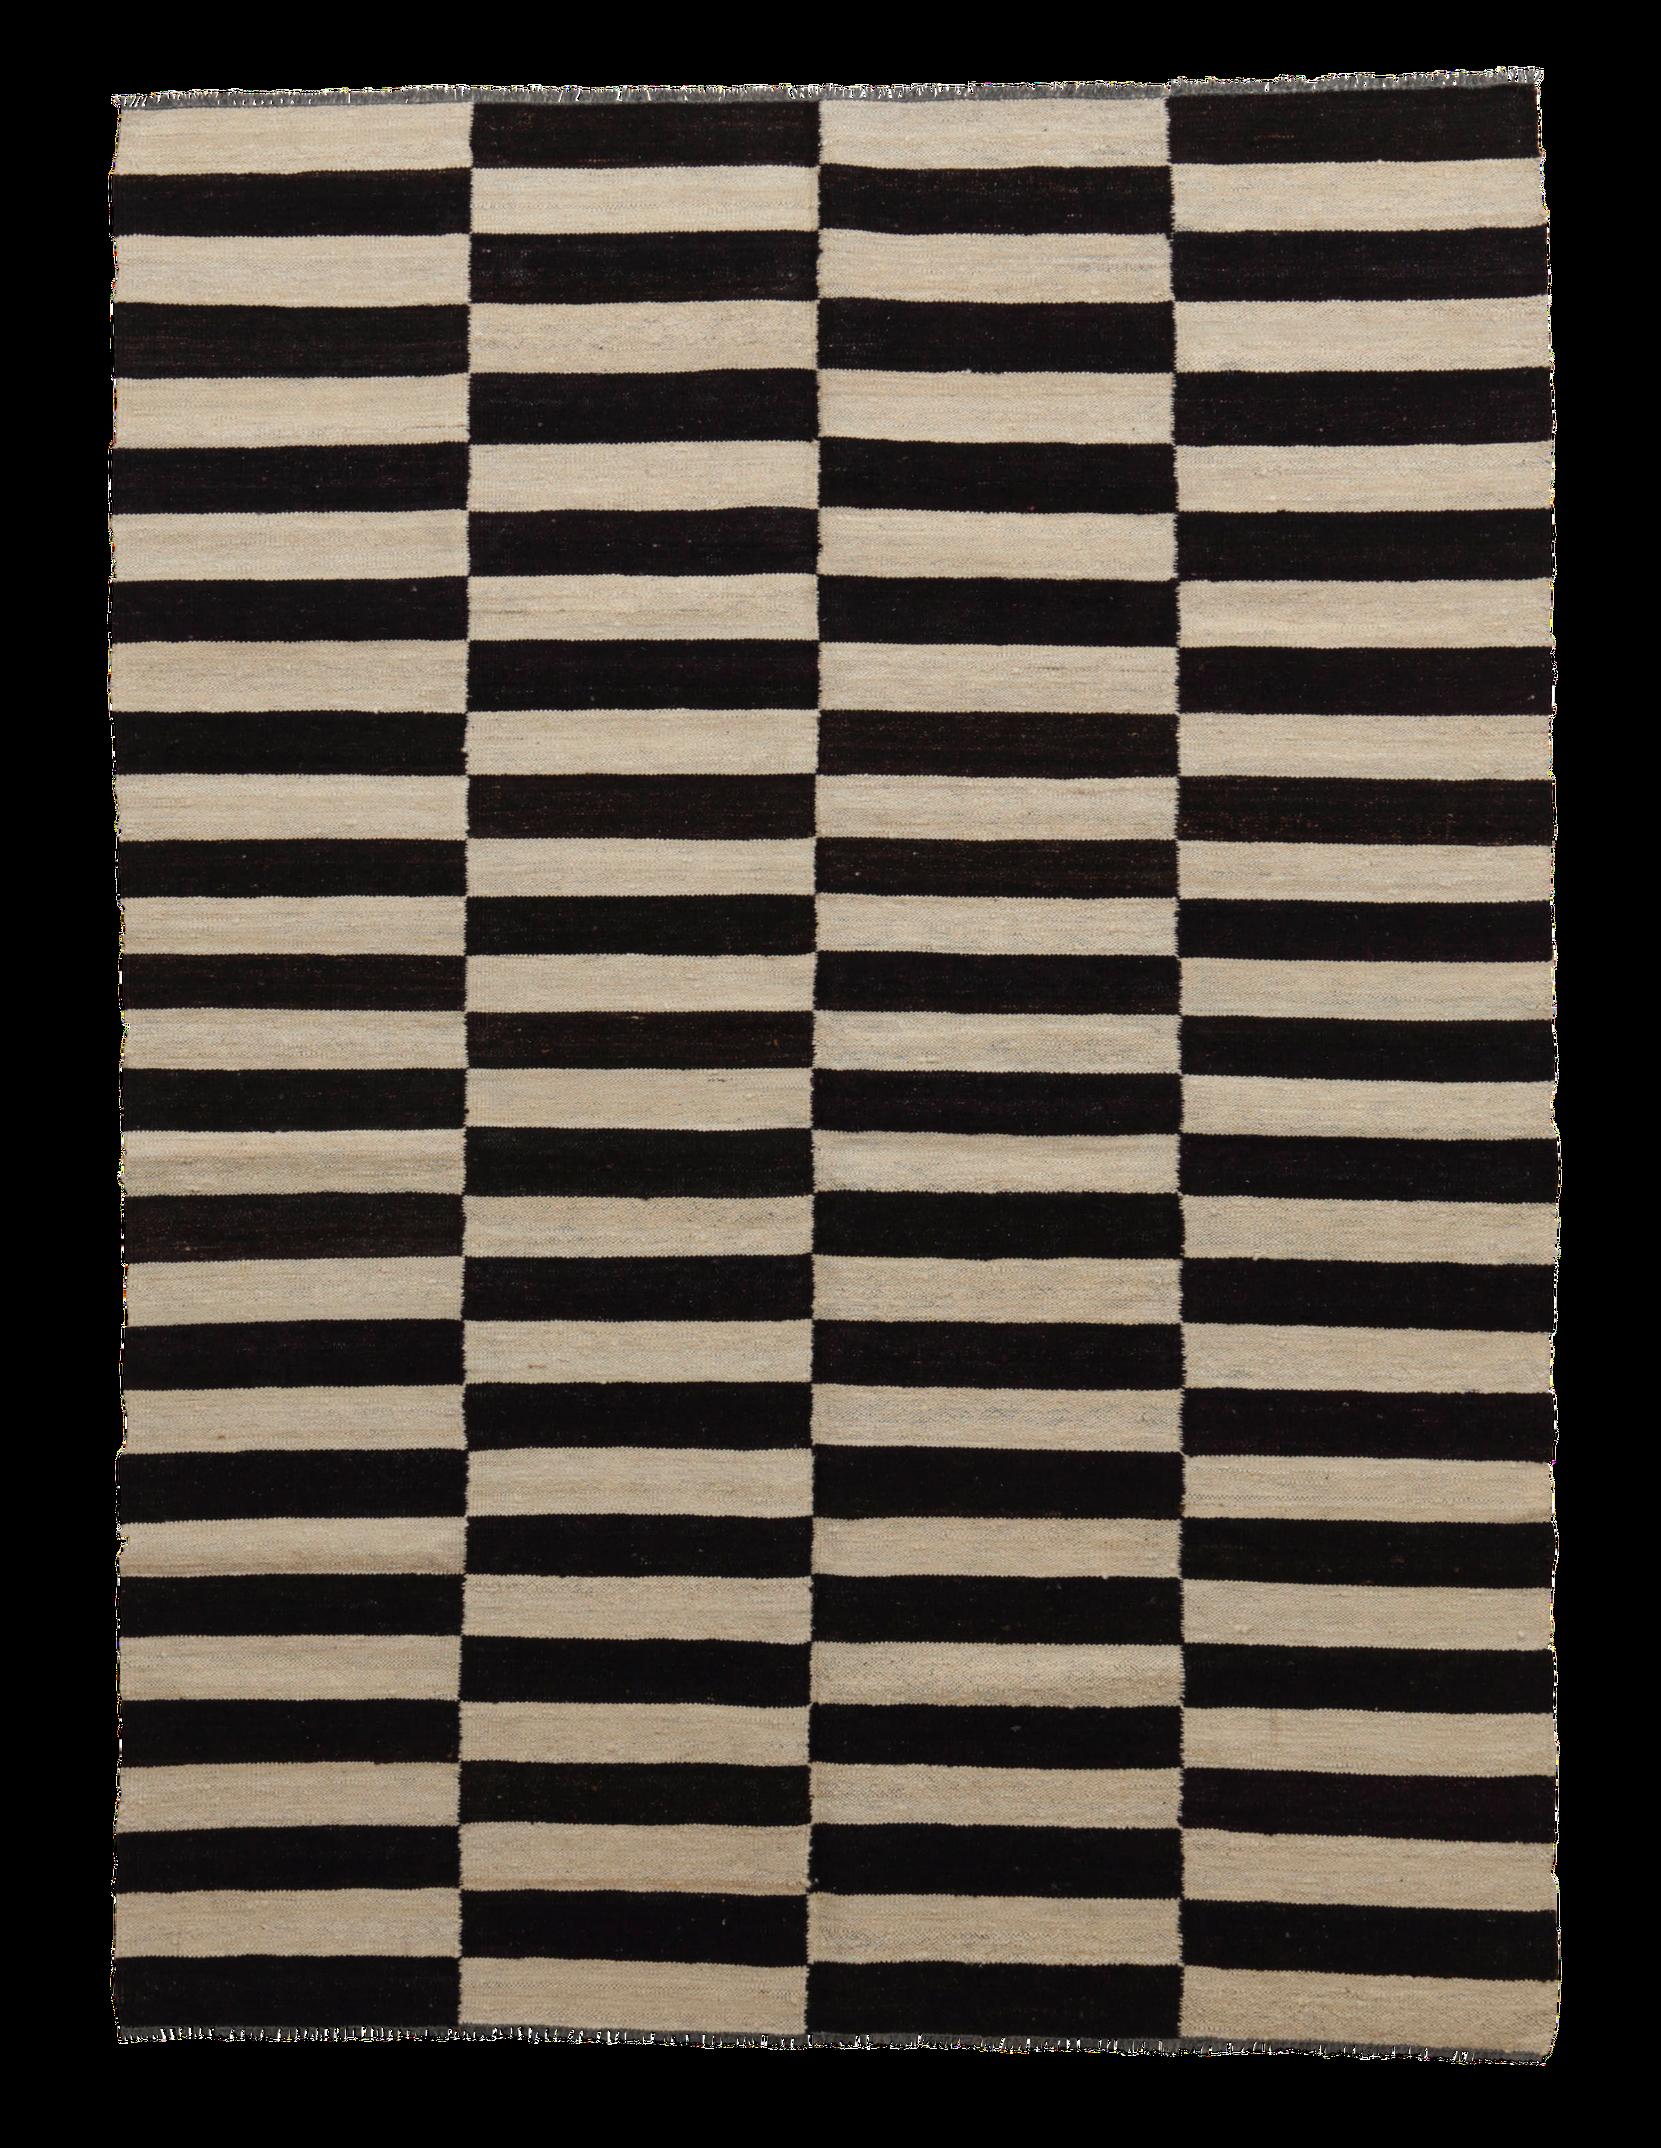 Kelim-matto, n. 200x300 cm